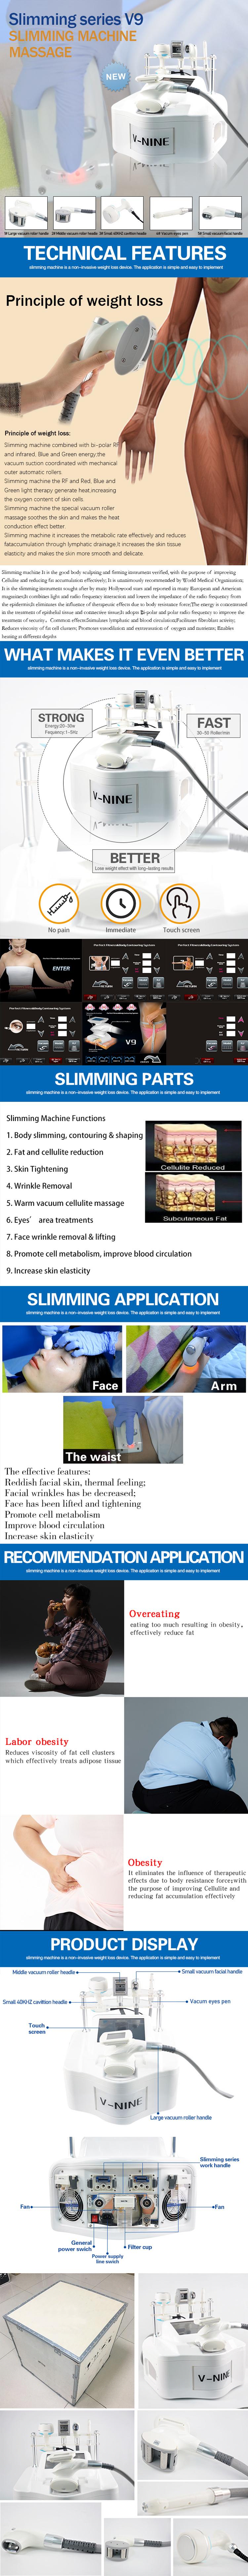 V9 Body Slimming Machine product details